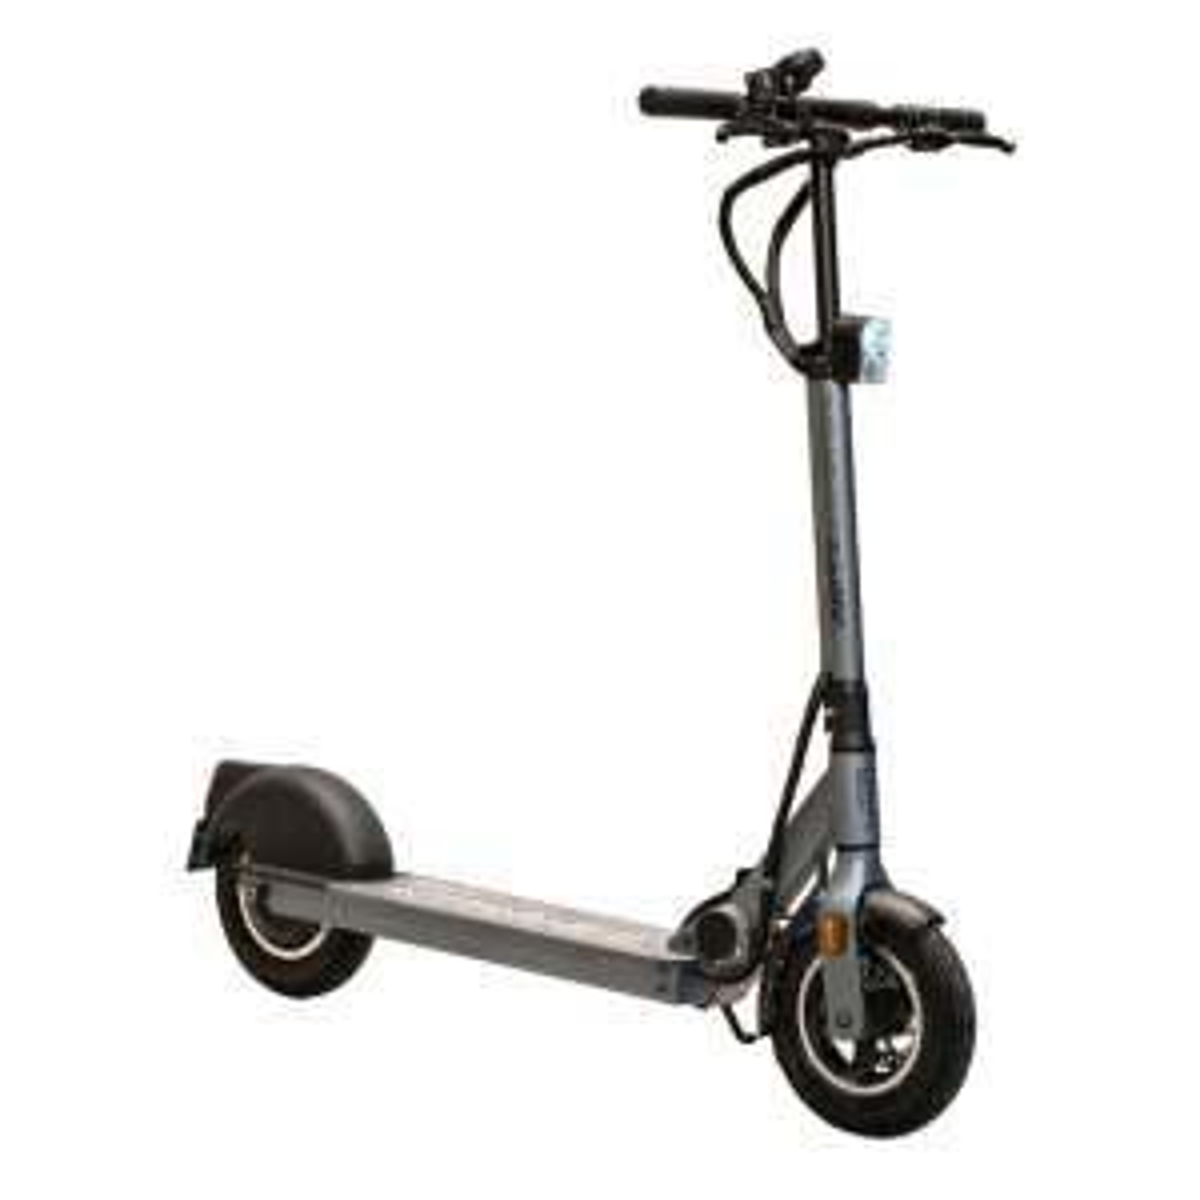 EGRET THE URBAN #HMBRG V3 E-Scooter mit Straßenzulassung